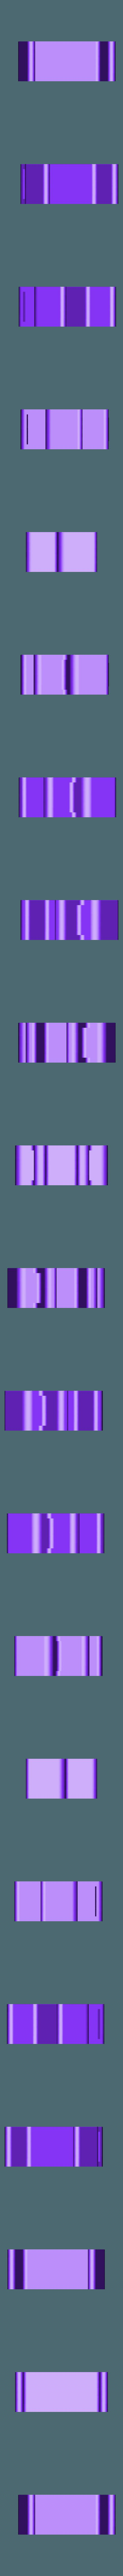 body_19mm.stl Download free STL file Shelf brackets for ivy • 3D printing template, kumekay